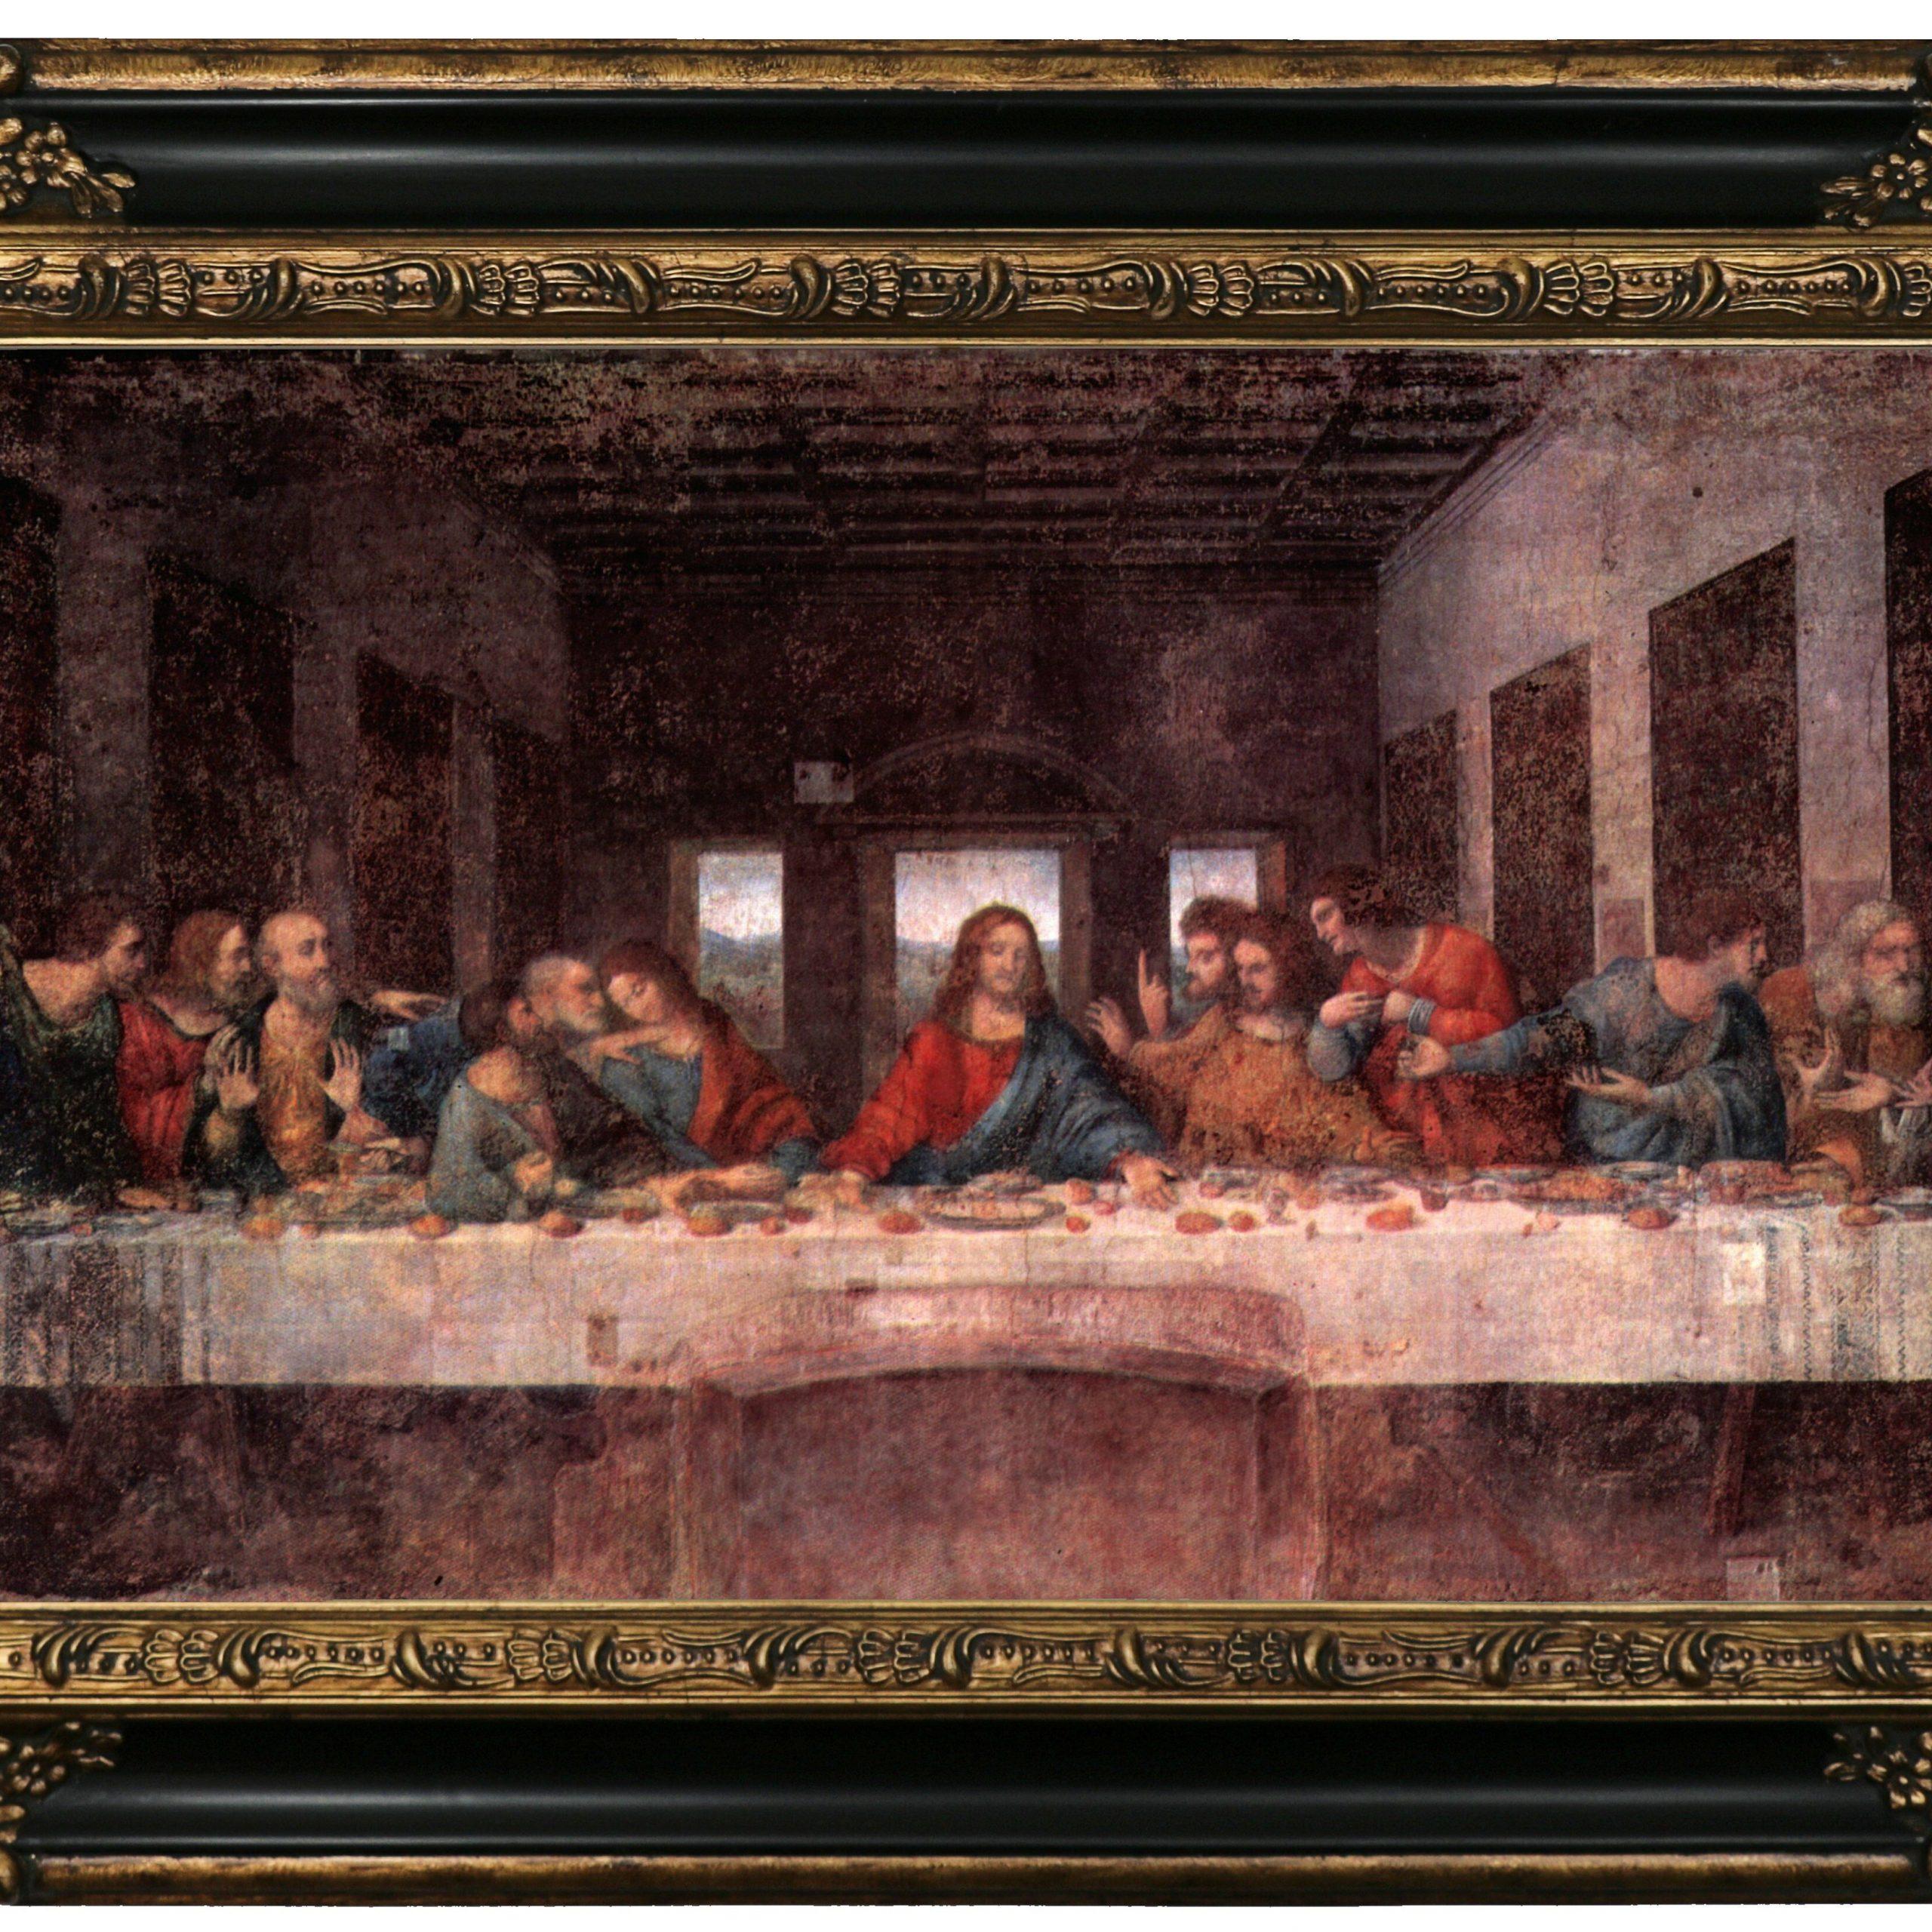 Art Prints Jesus Christ The Last Supperleonardo Da Vinci With Newest Blended Fabric Leonardo Davinci The Last Supper Wall Hangings (View 15 of 20)